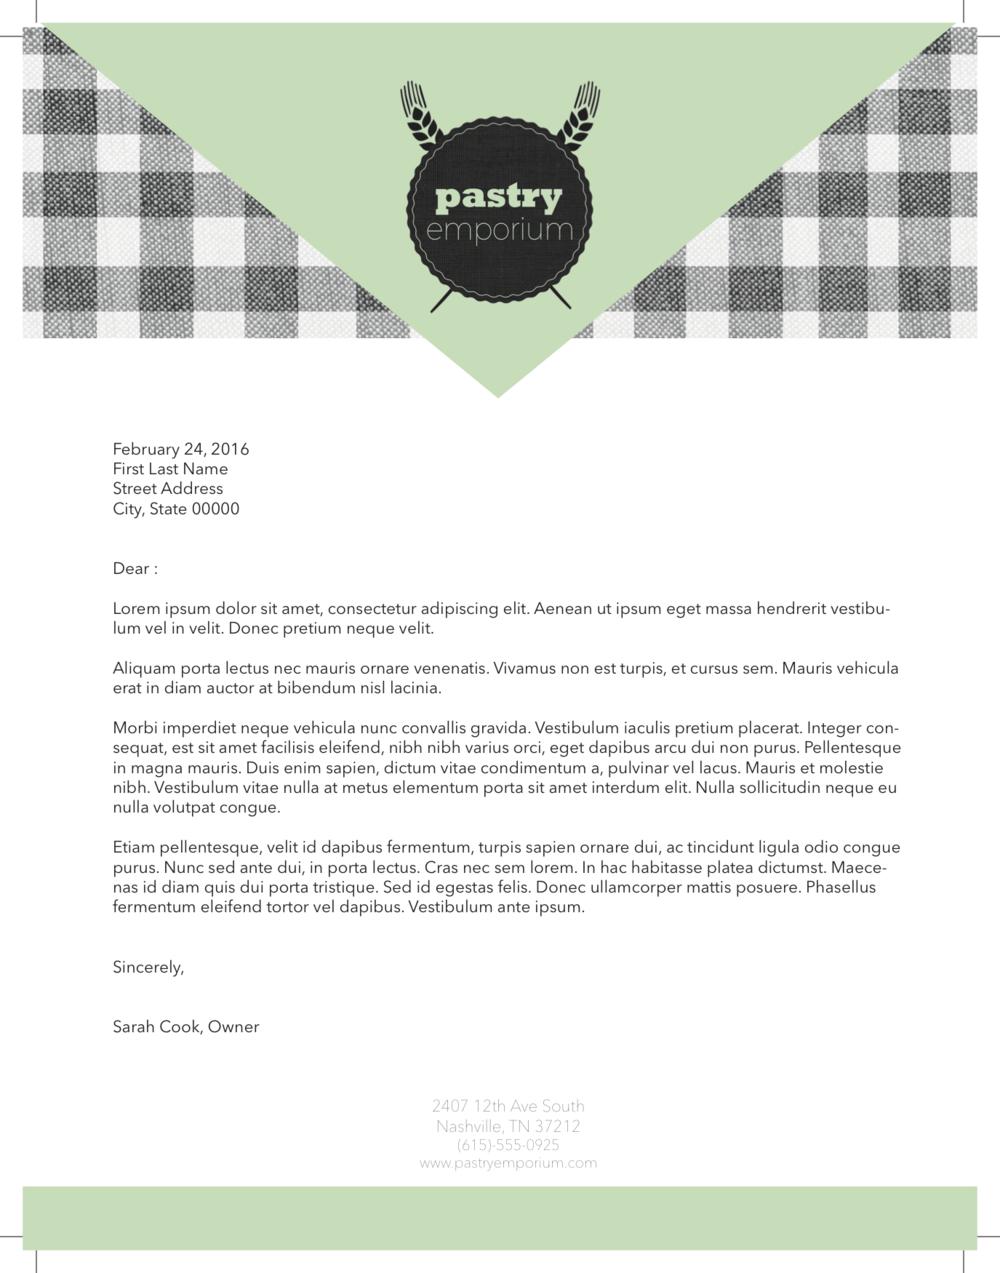 letterhead3.png